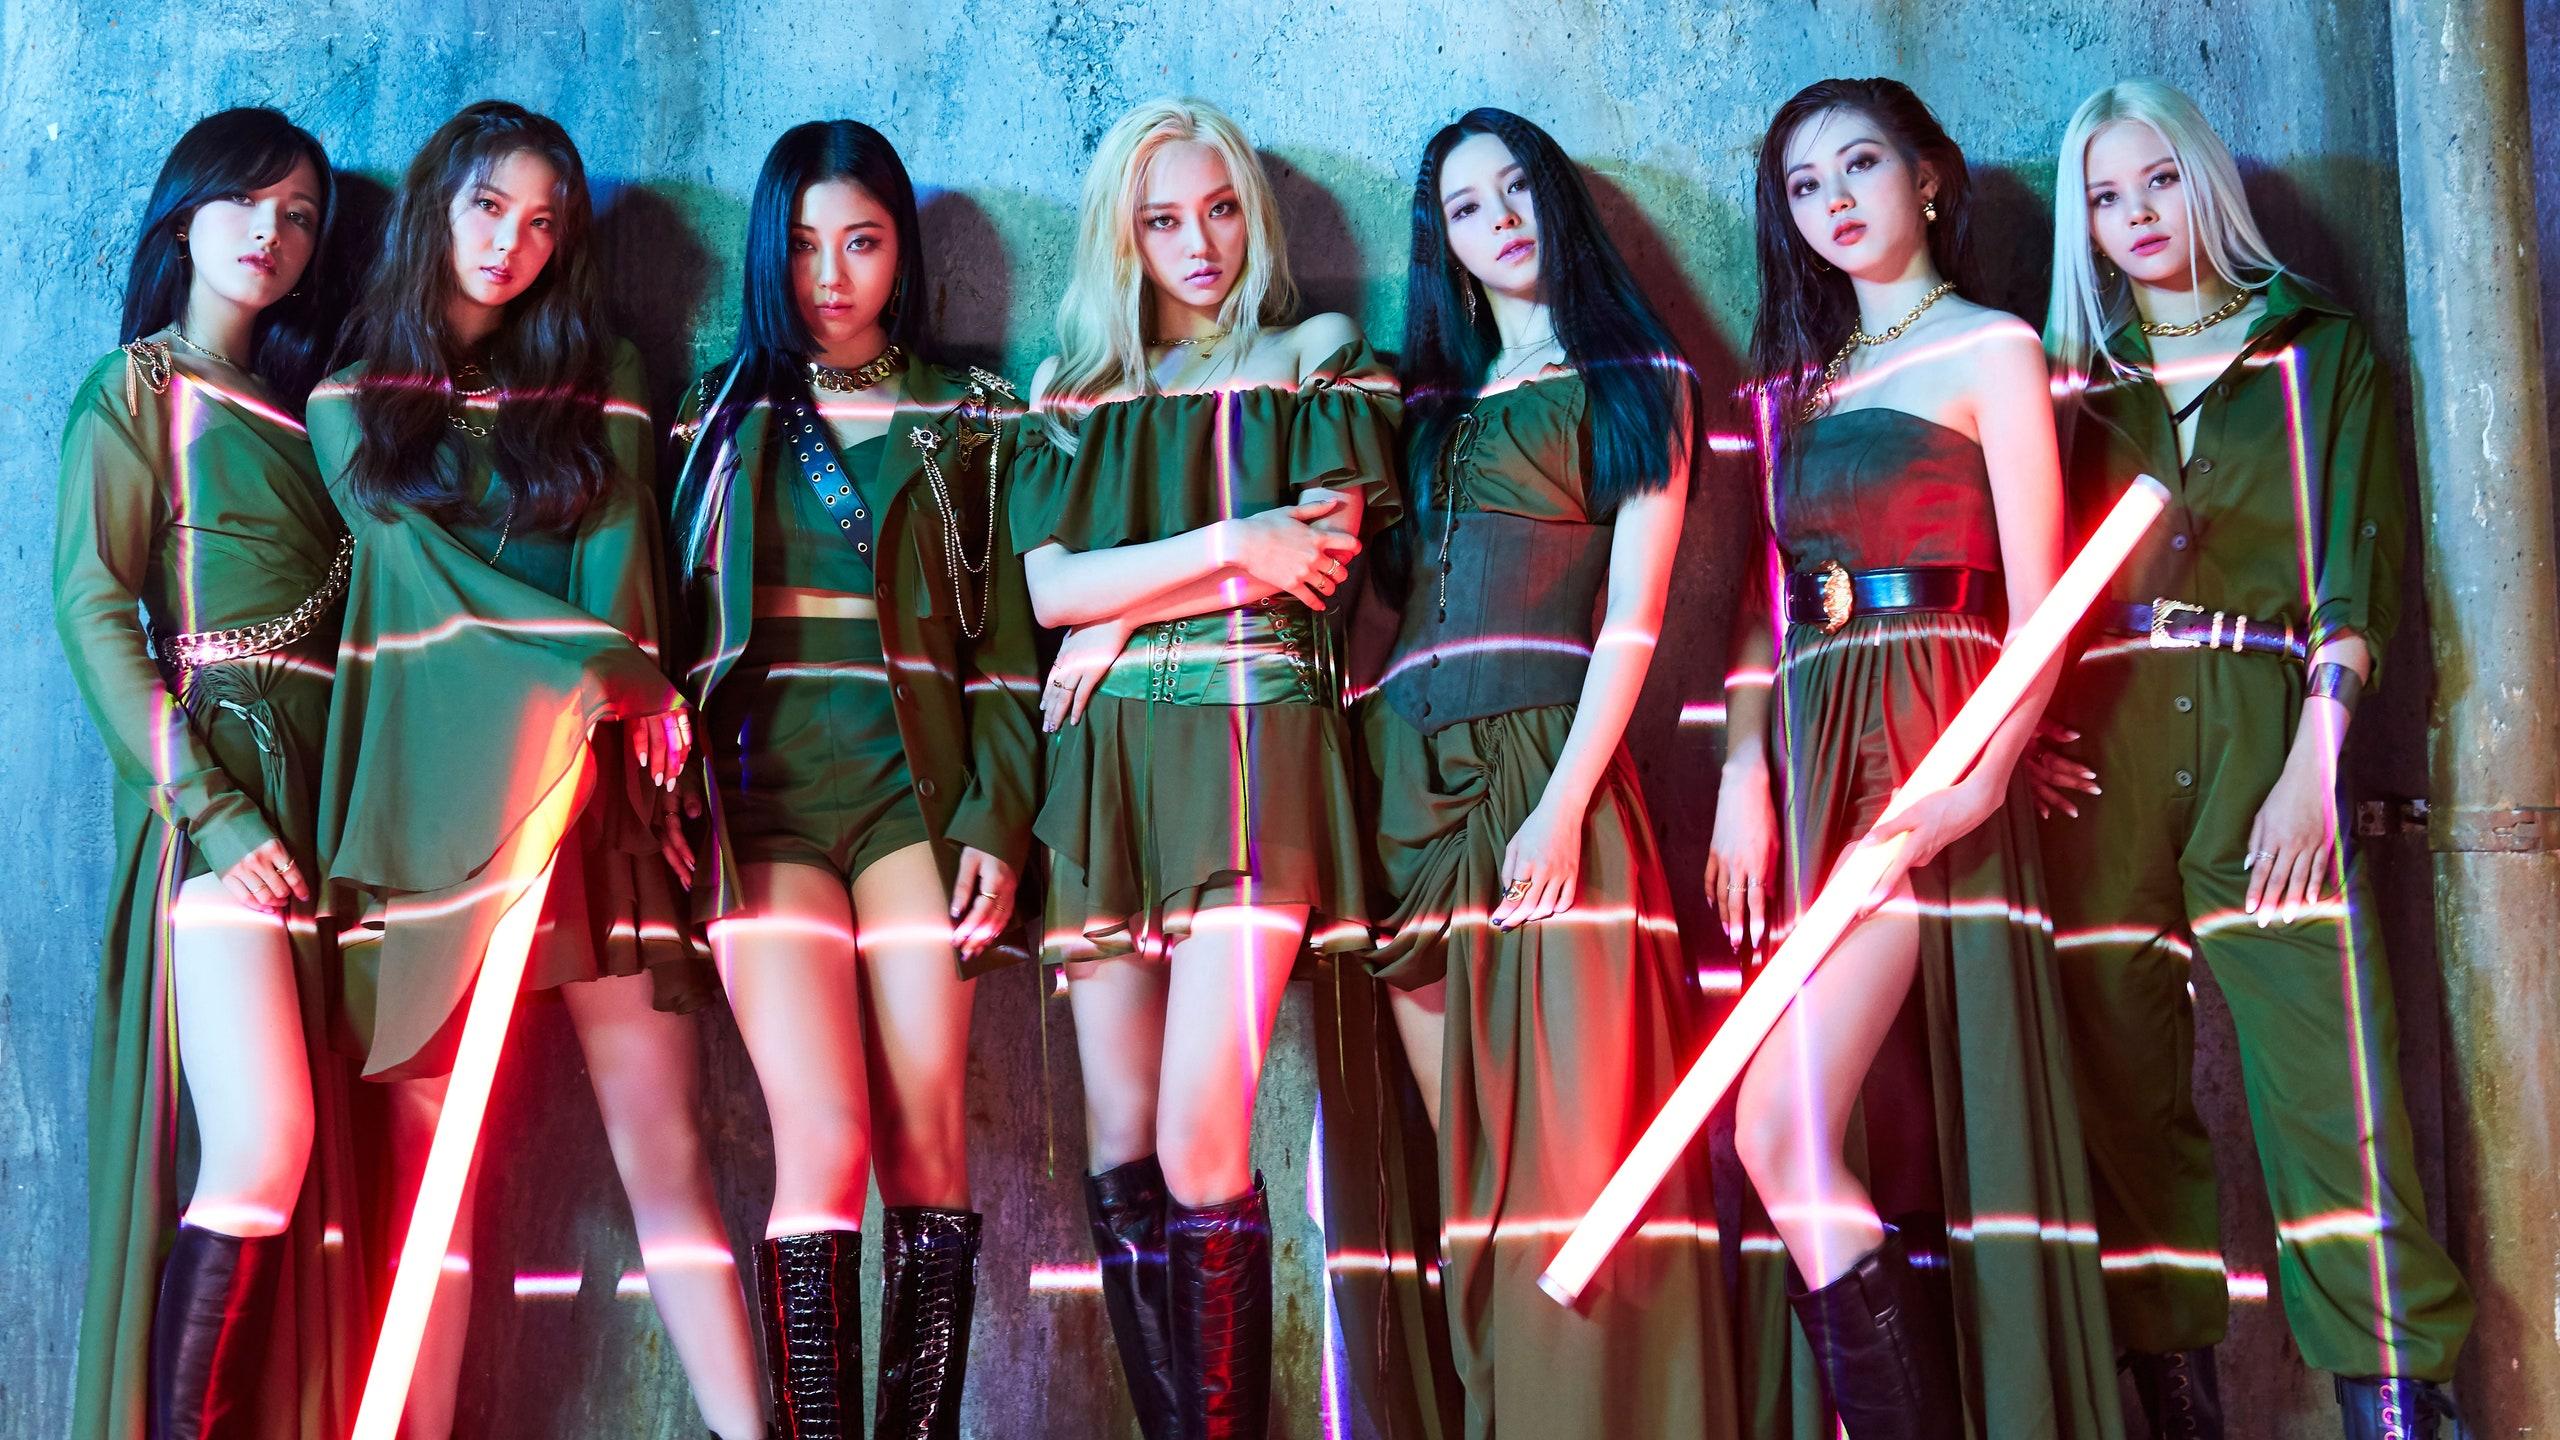 lightstick clc Cube Entertainment